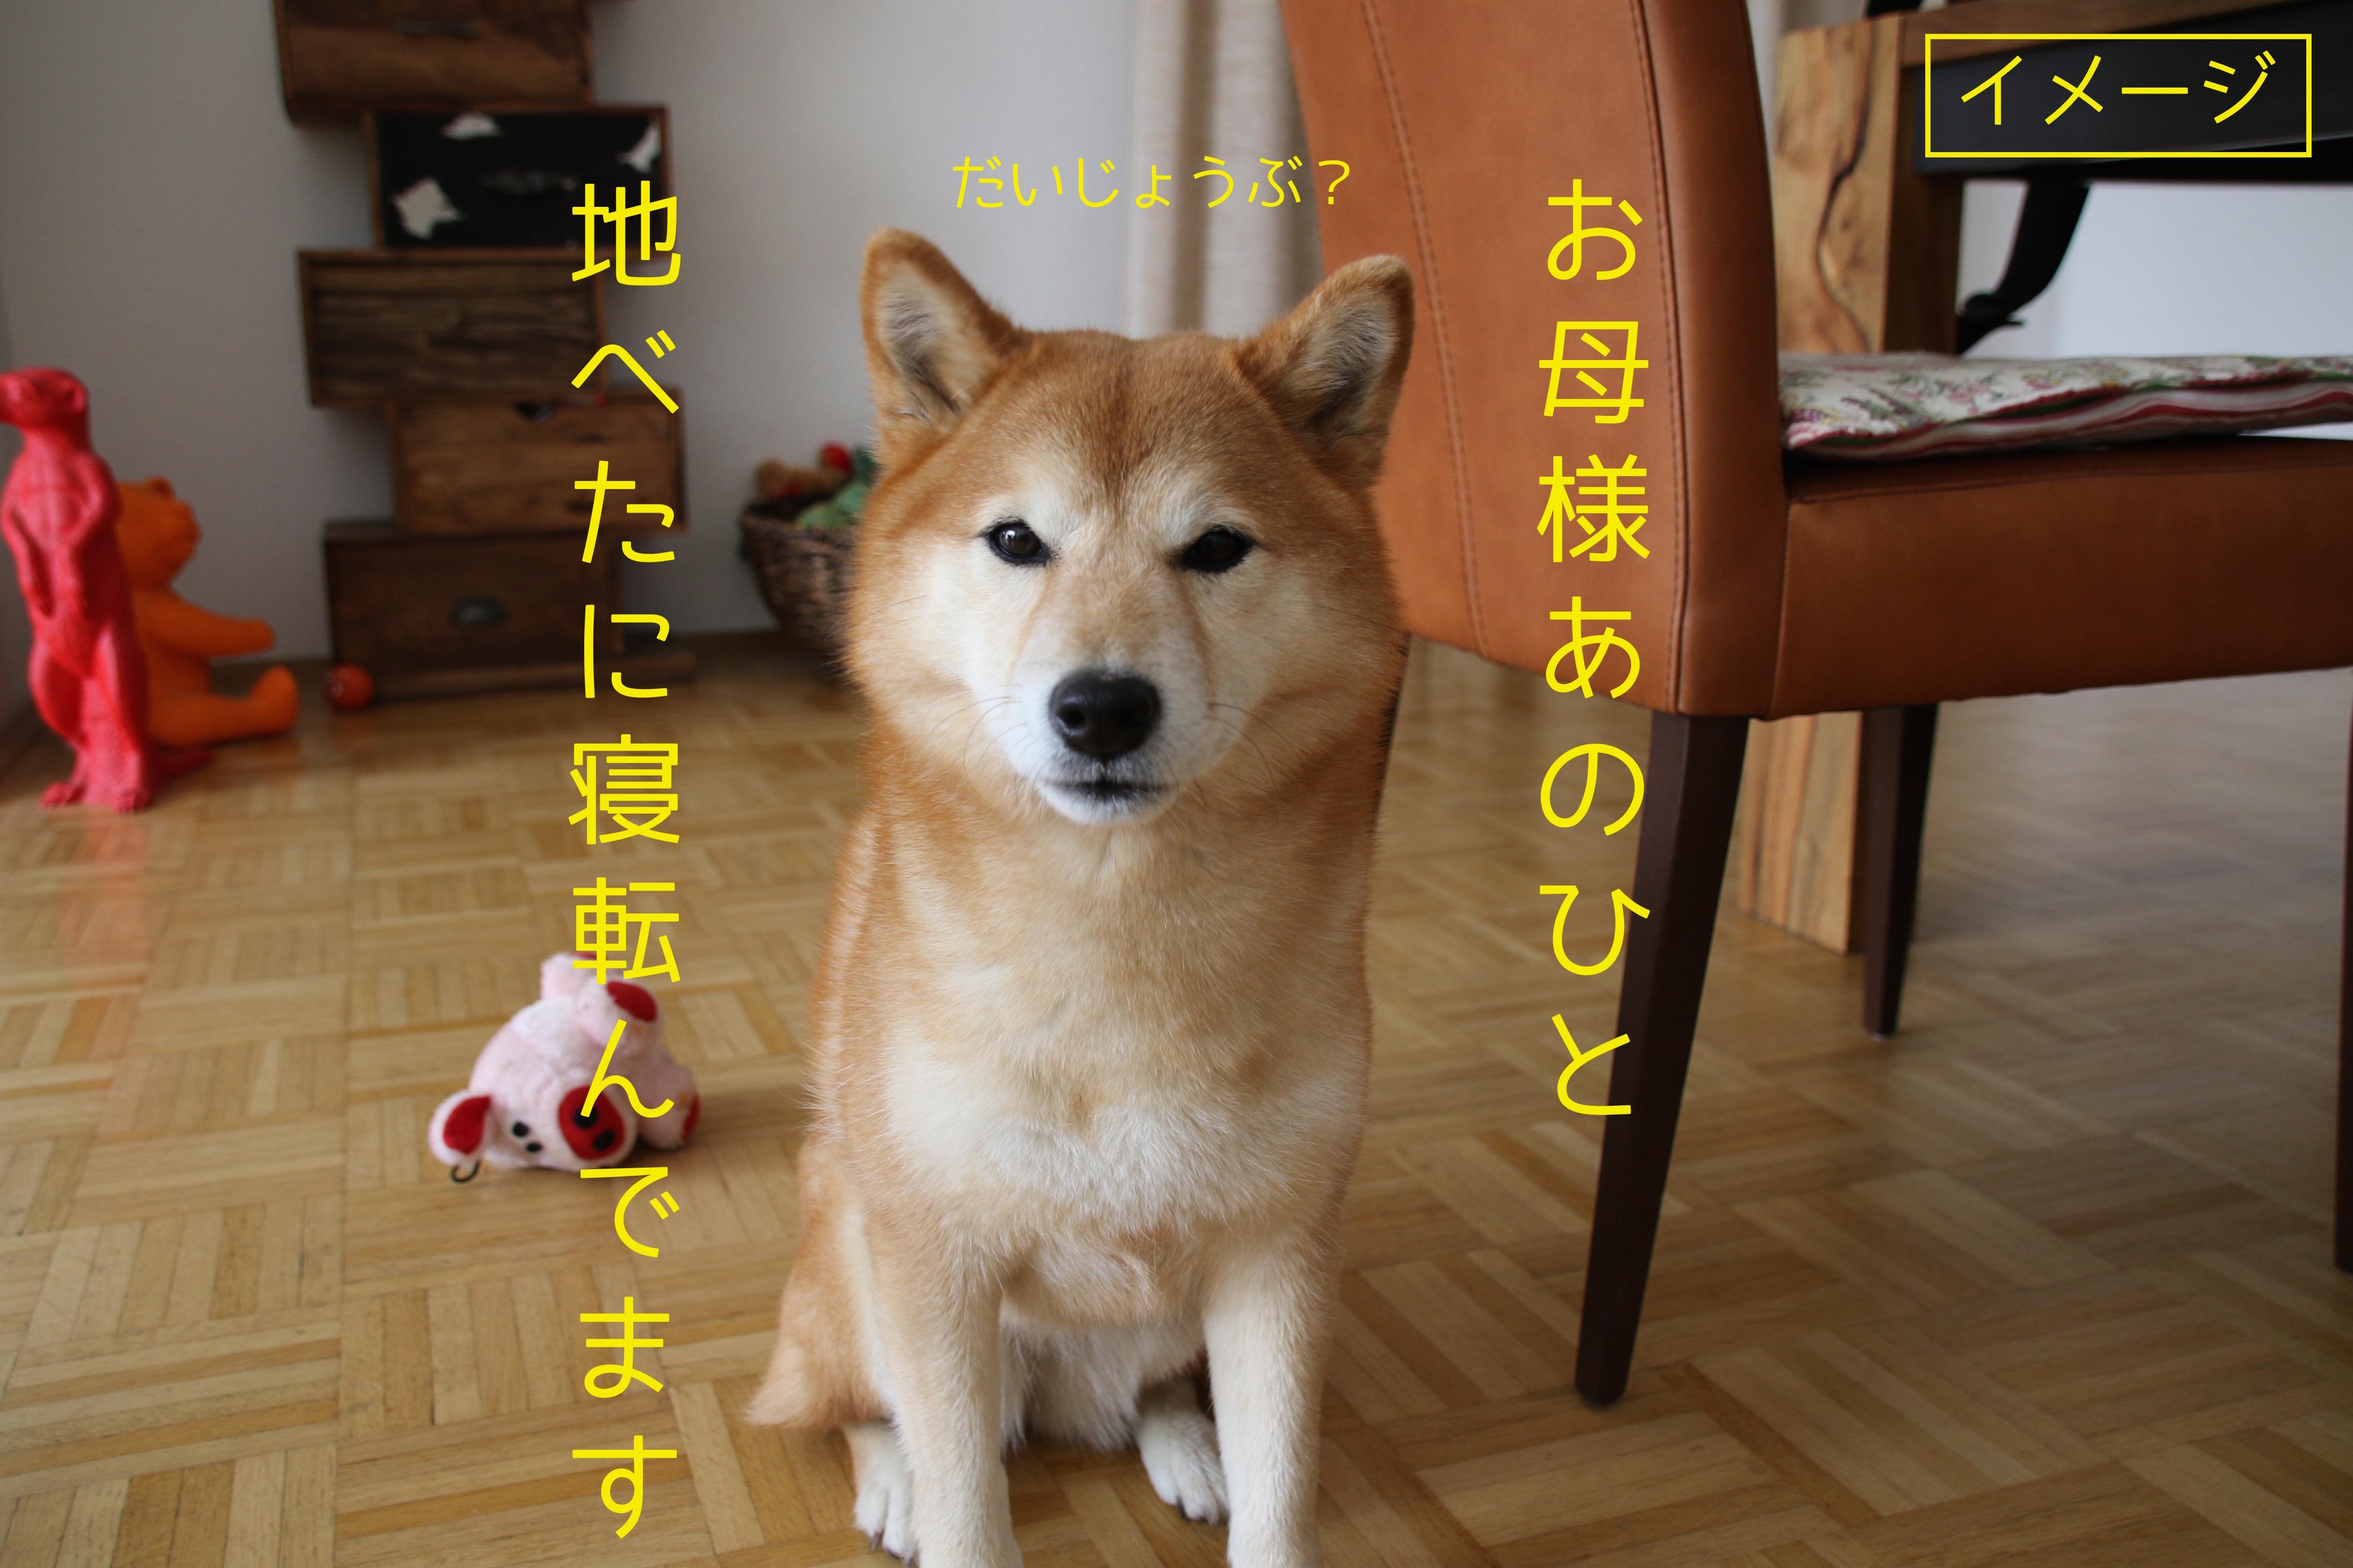 20160428034925ca7.jpeg